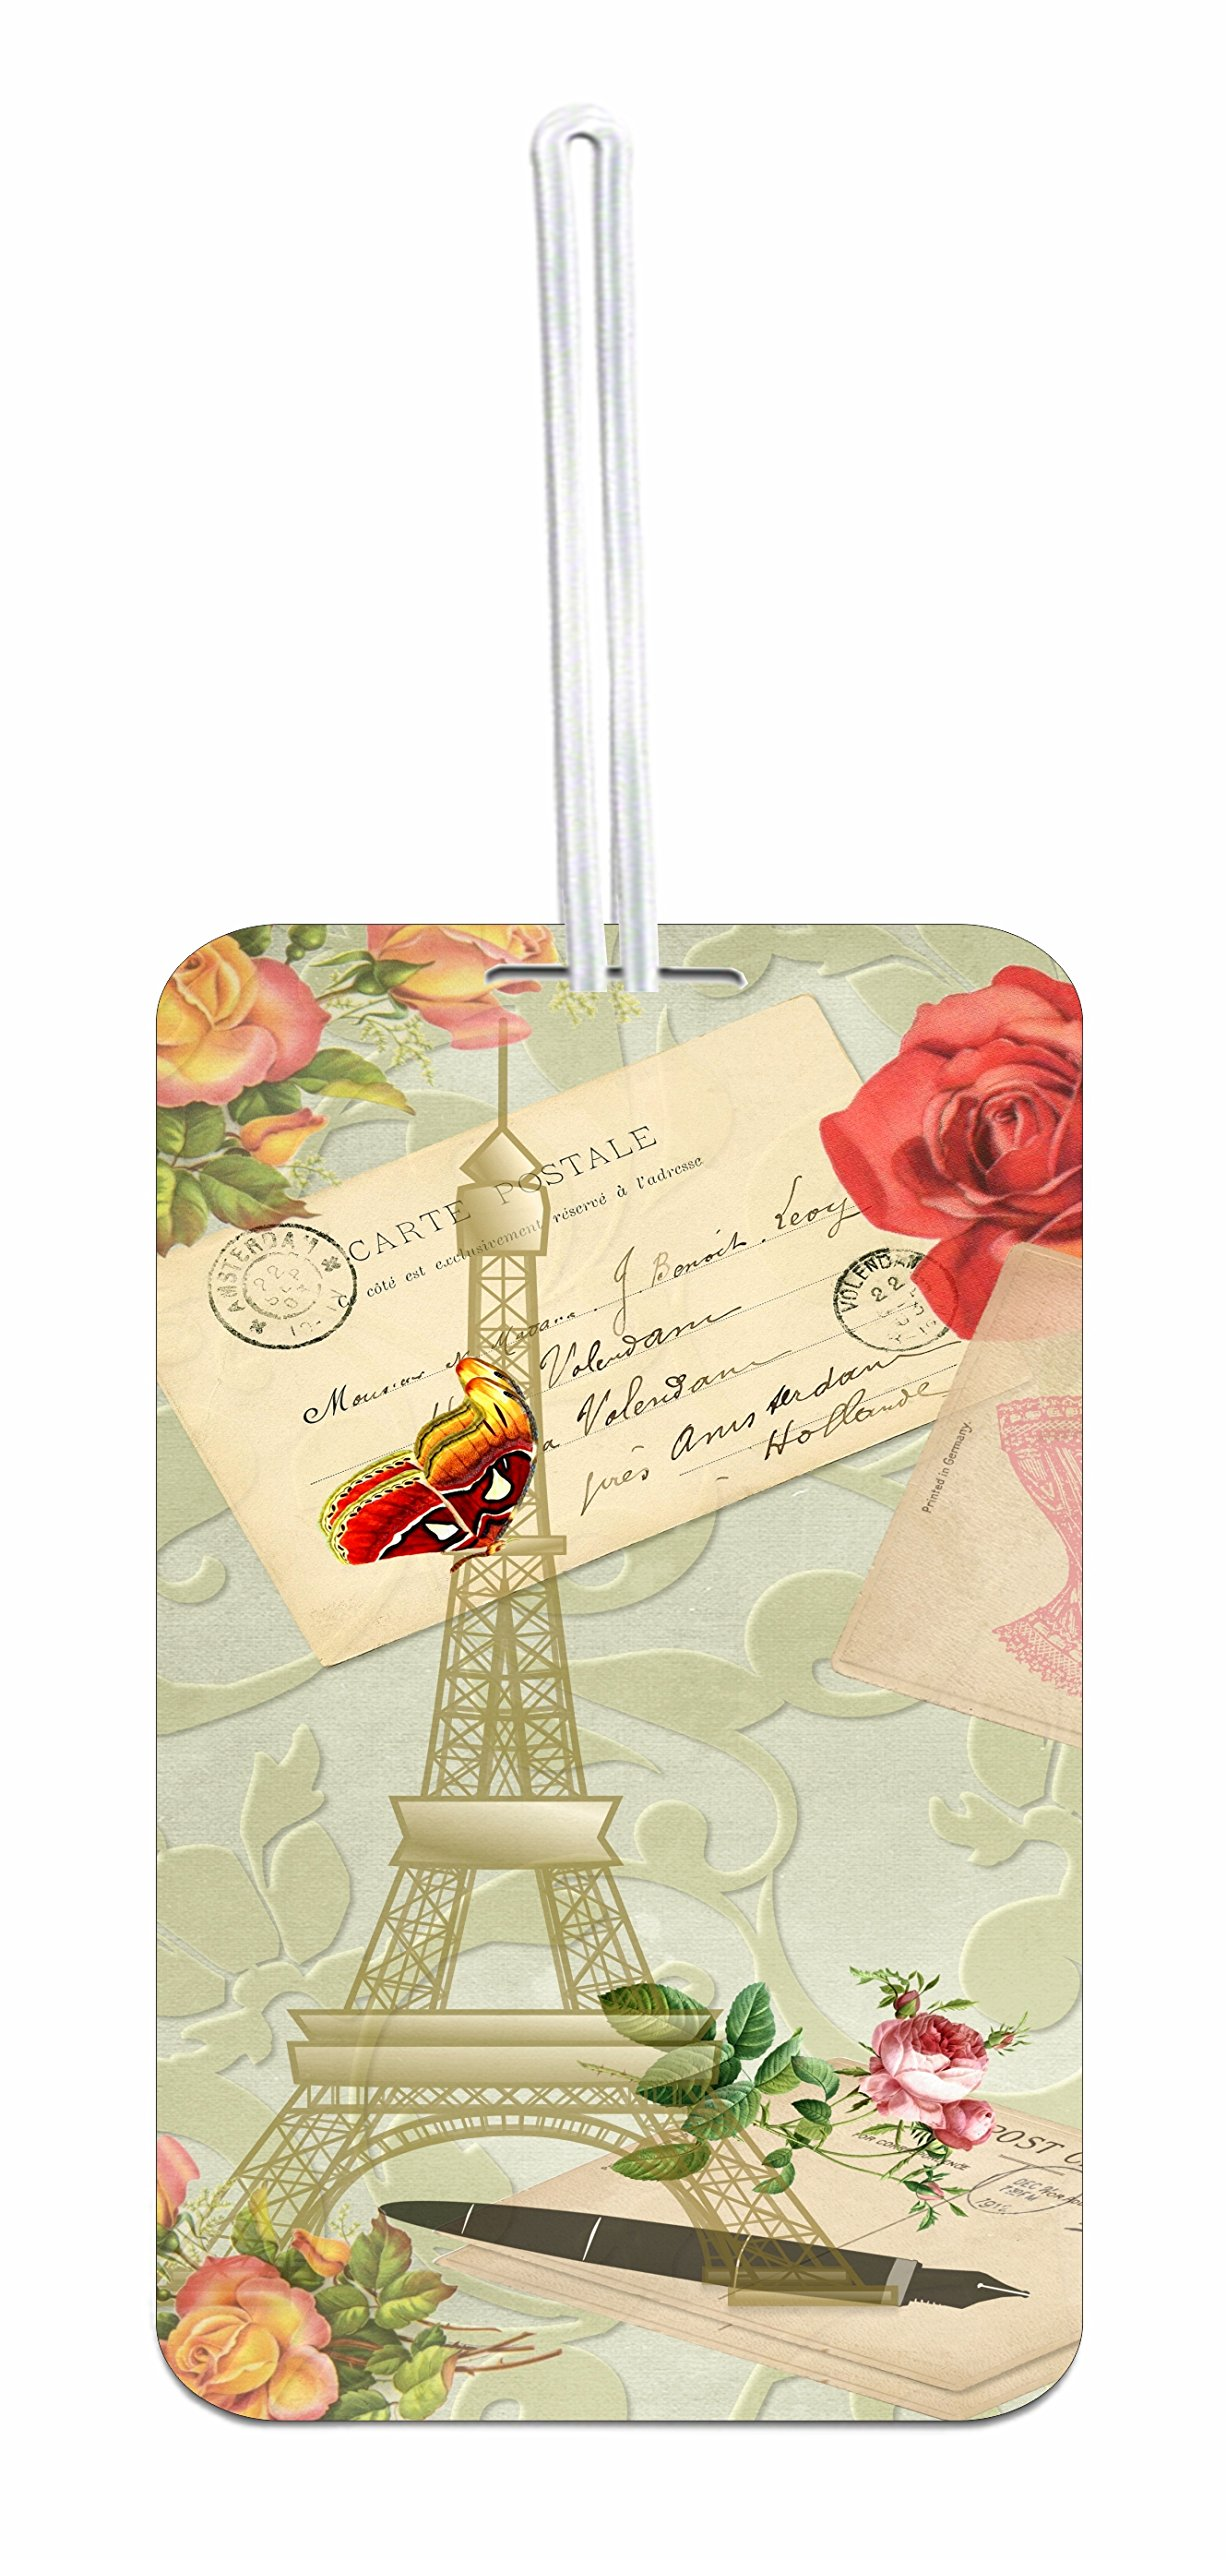 Vintage Style Paris School Bag/Backpack ID Tag with Custom Back